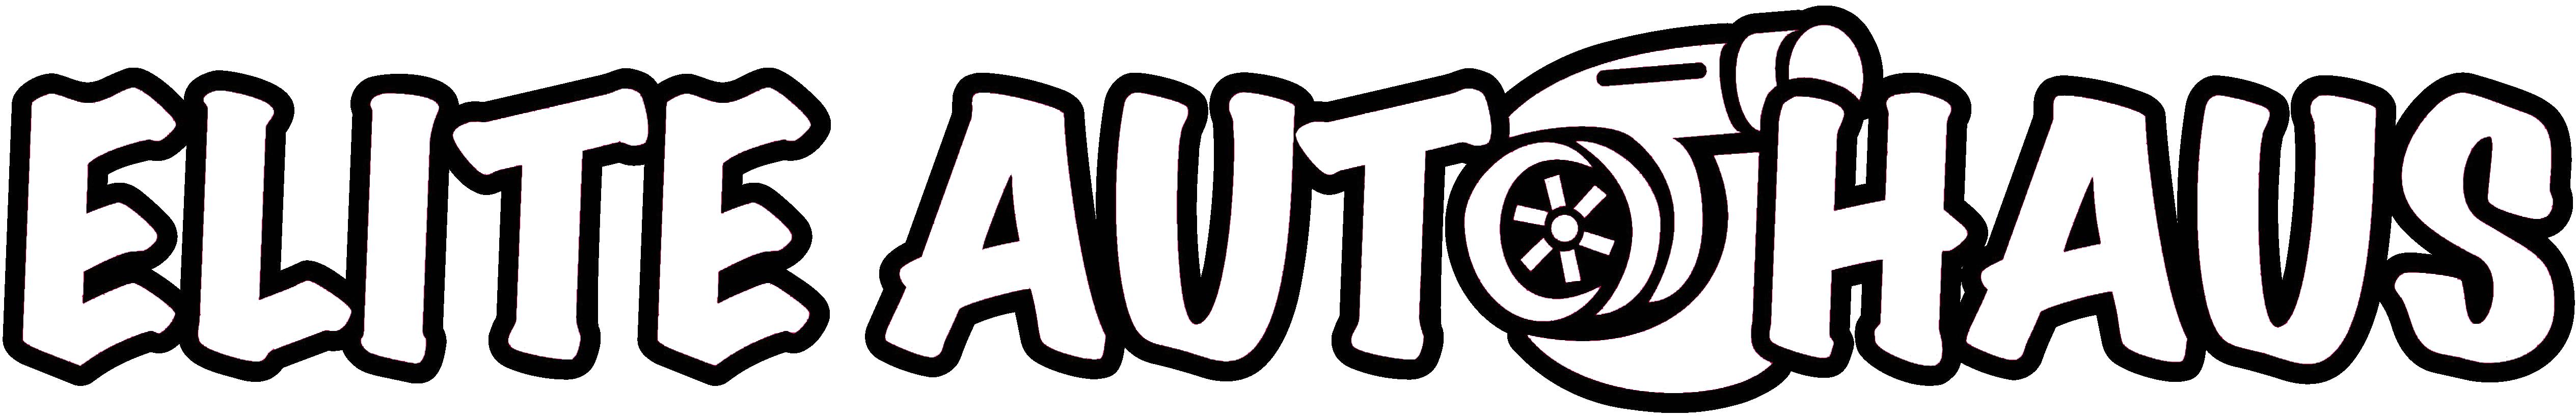 Elite Autohaus